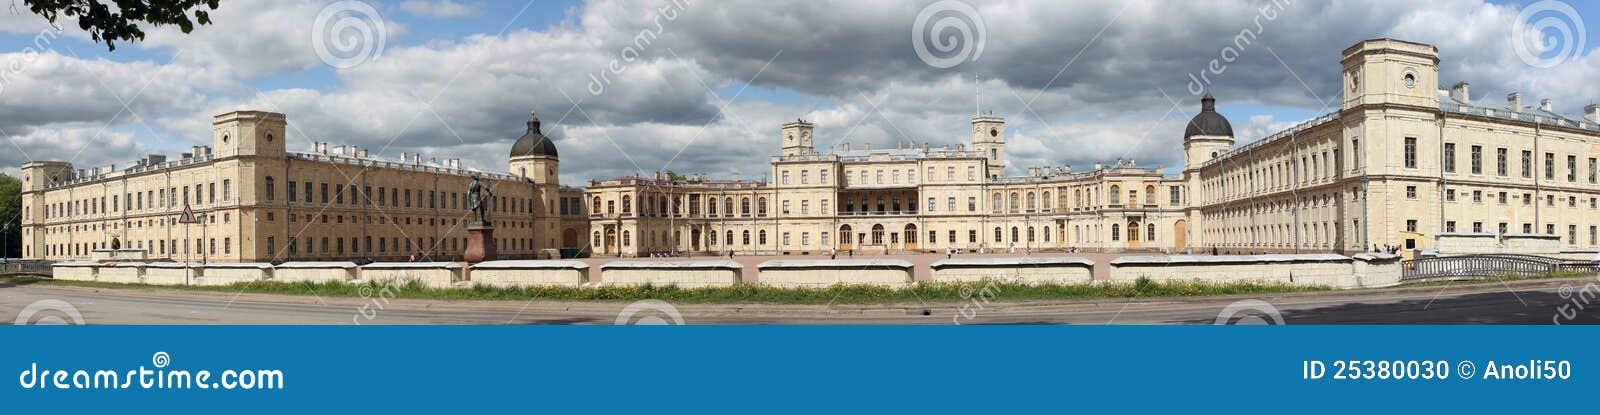 Panorama del palazzo